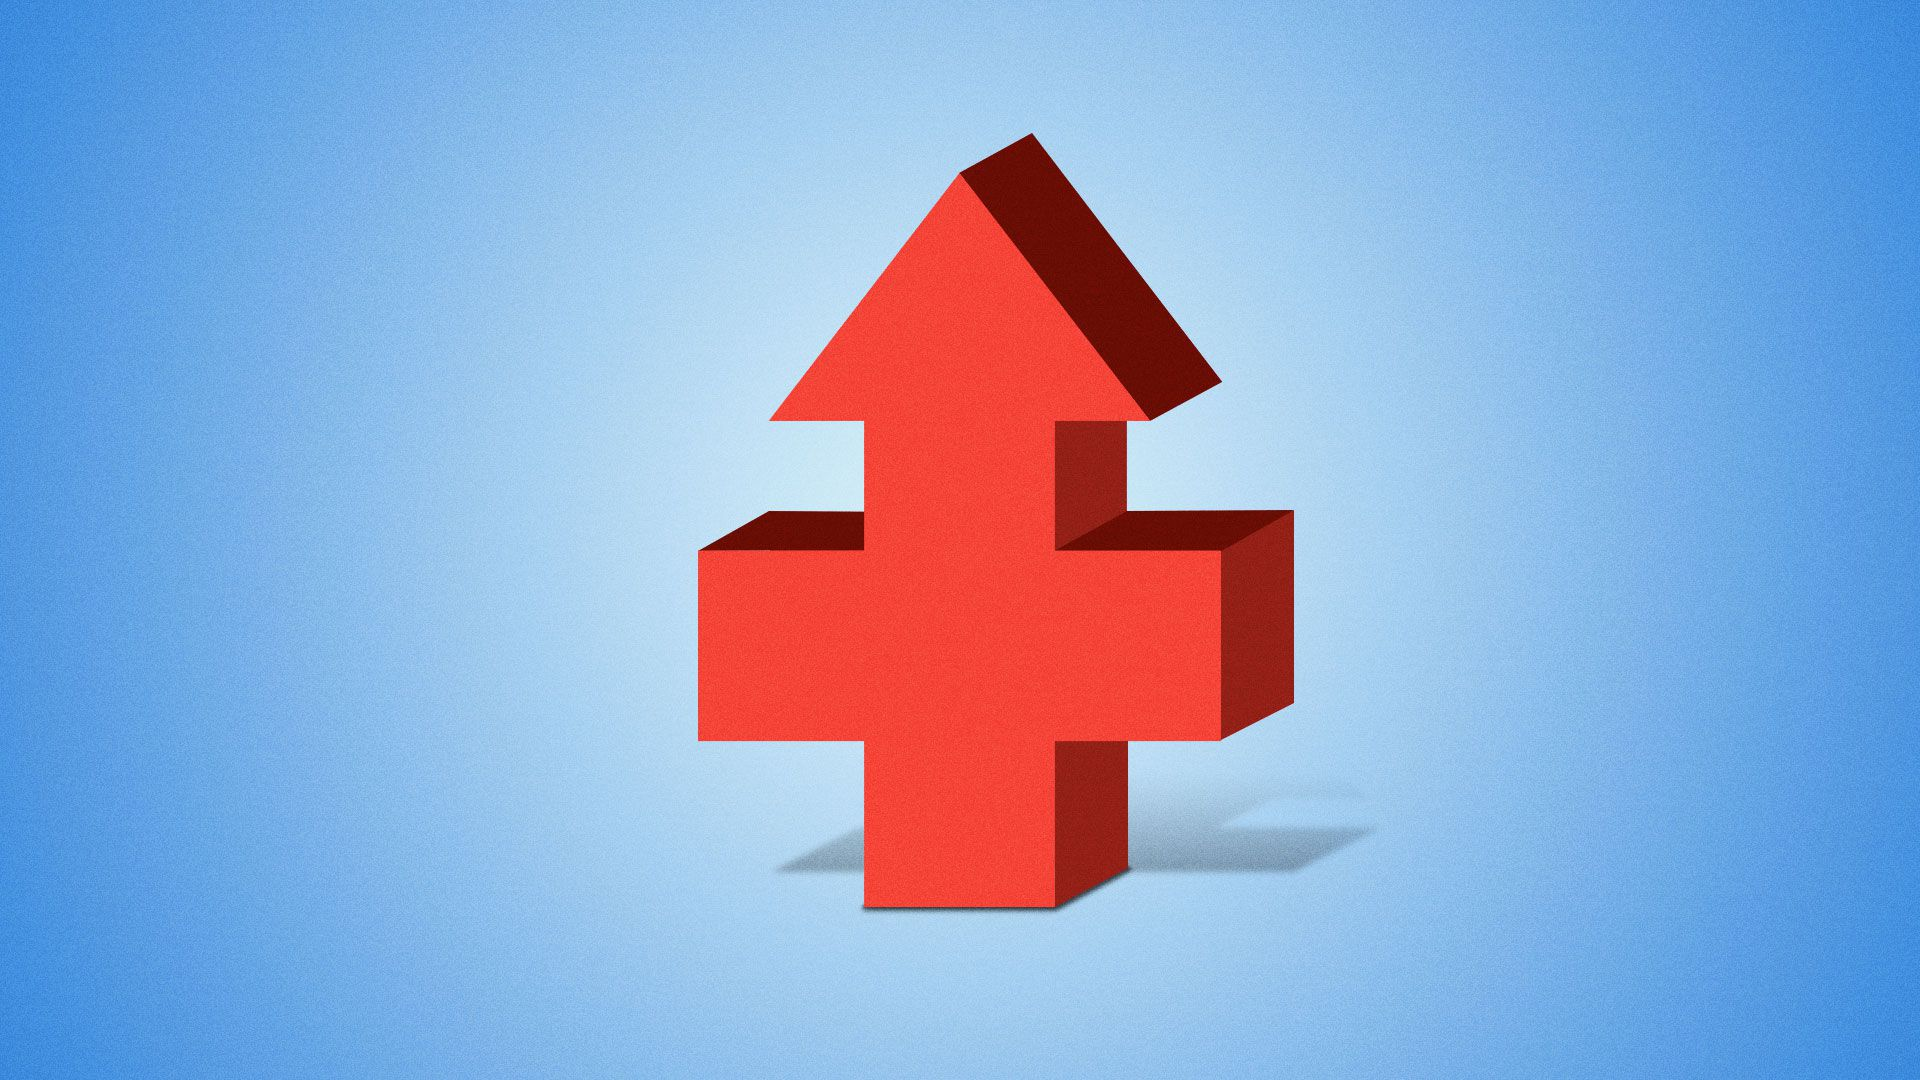 Illustration of a health/ hospital plus with an upwards arrow